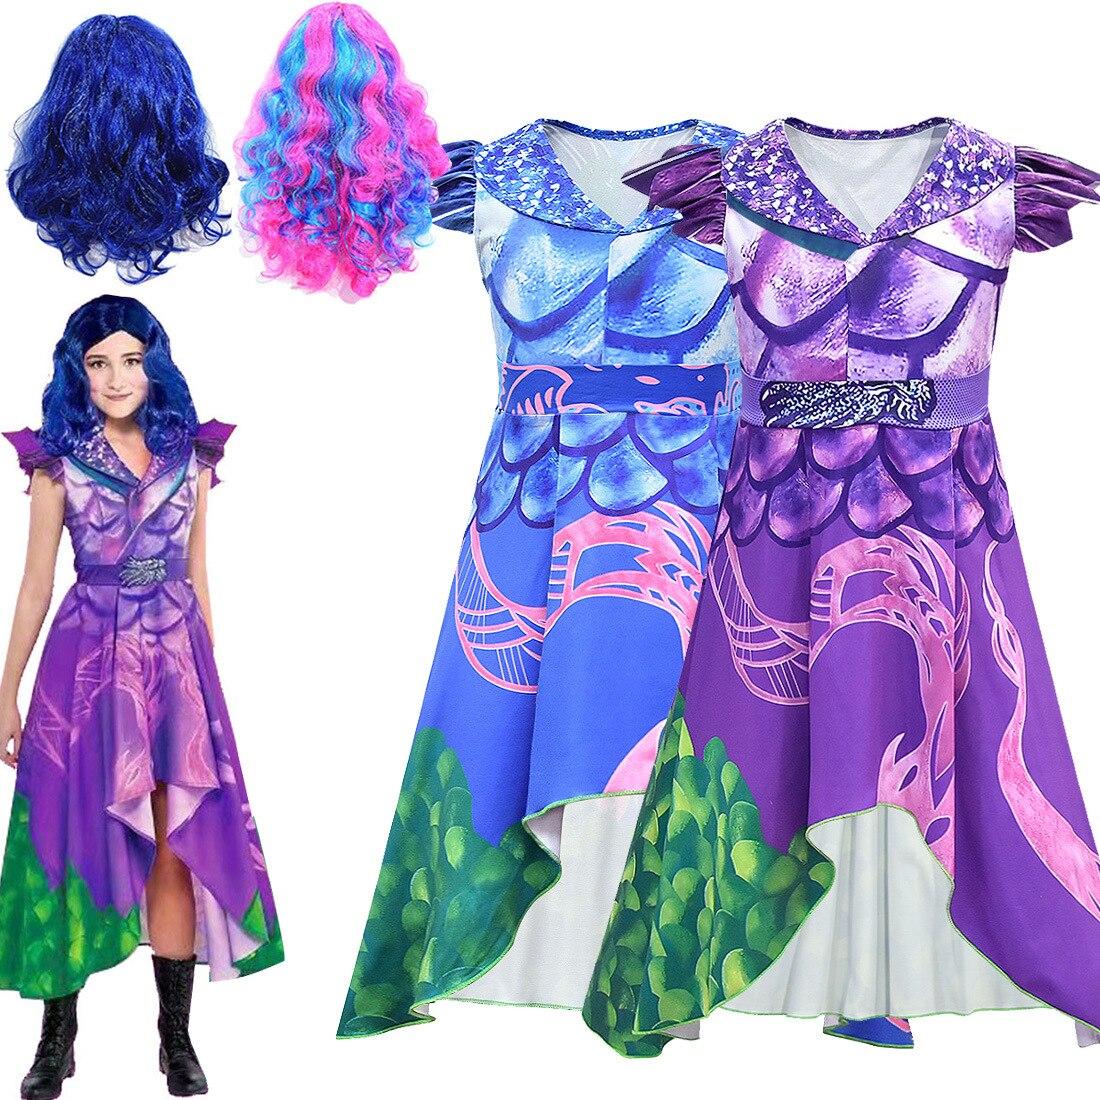 Meninas cosplay traje descendentes 3 vestido roxo cosplay traje crianças 3d impresso halloween meninas carnaval festa meninas trajes